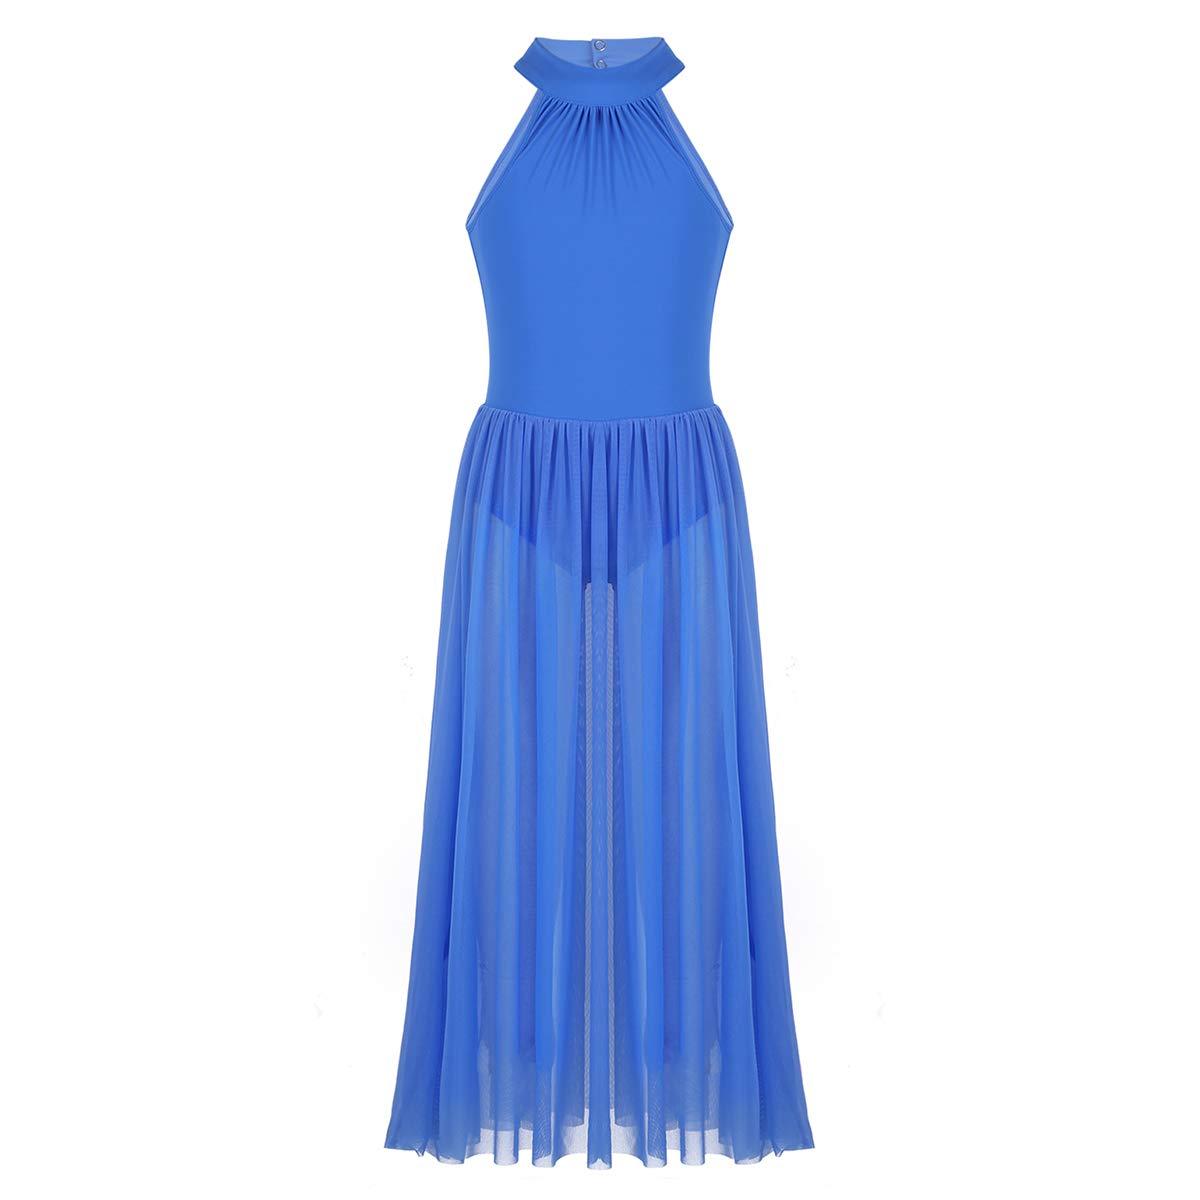 Alvivi DRESS ガールズ B07JHH2LVK 10 / 12|ブルー ブルー 43750